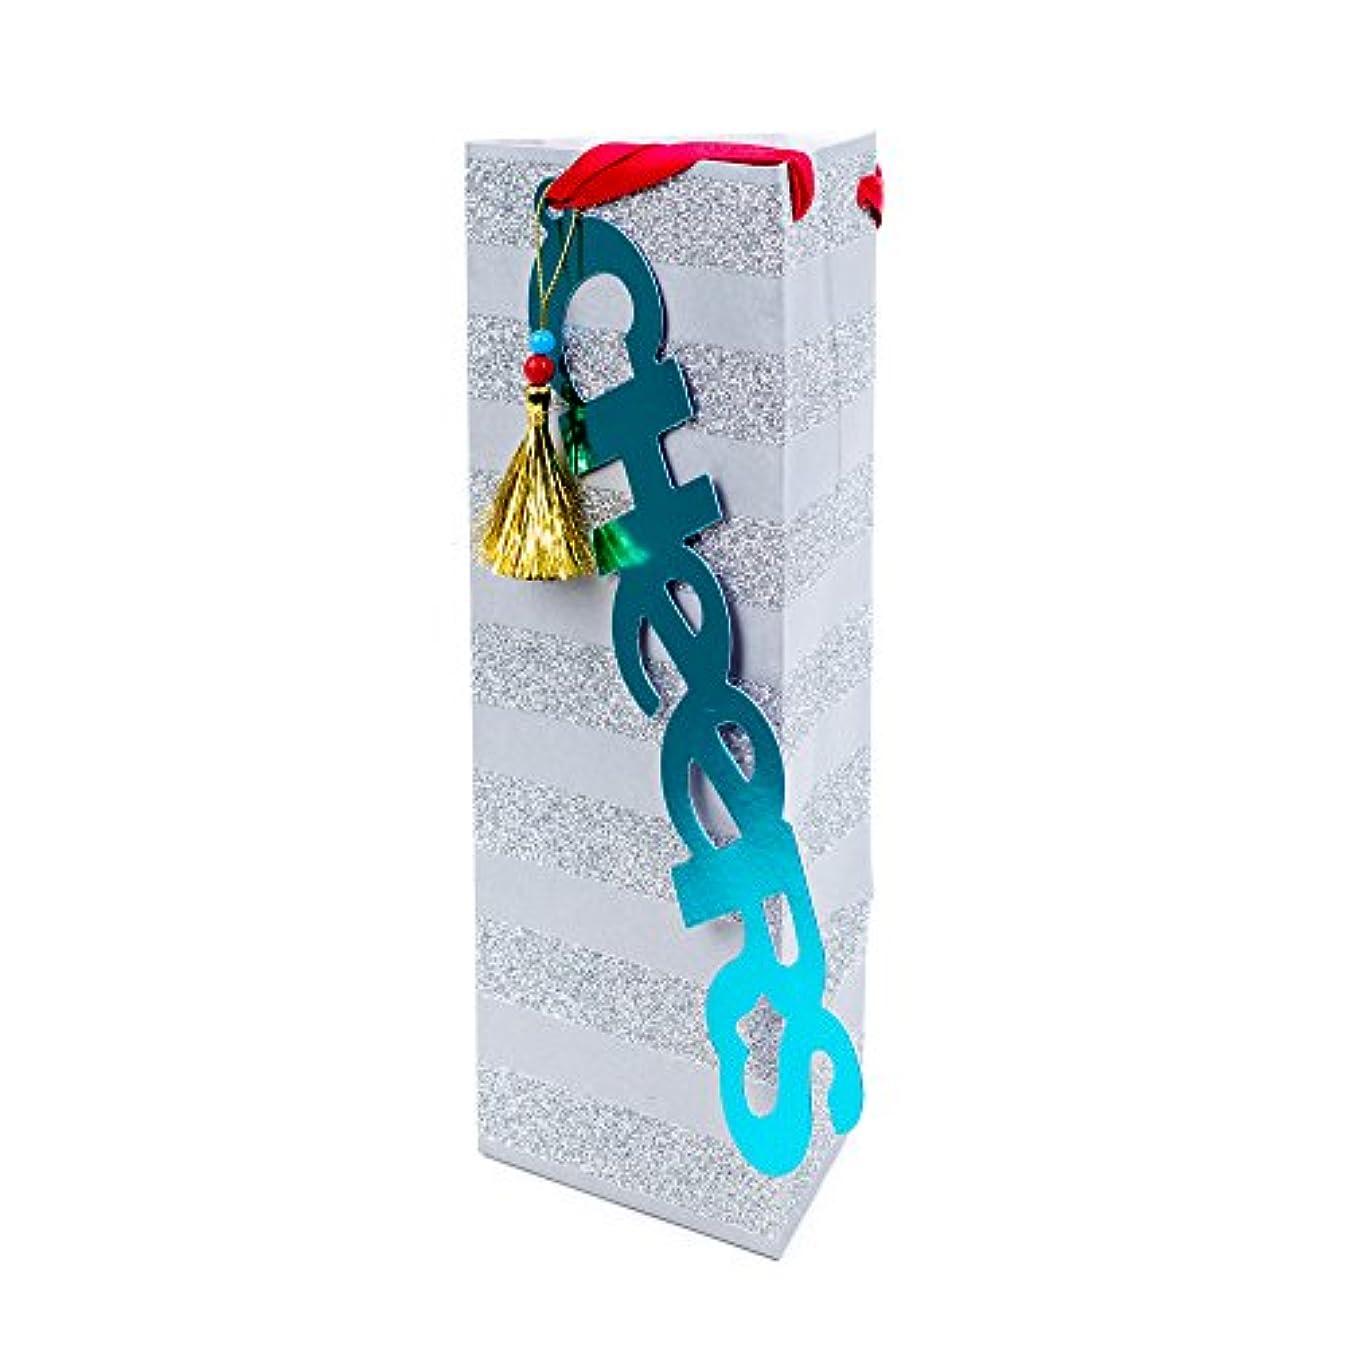 Hallmark Signature Holiday Bottle Gift Bag (Cheers)